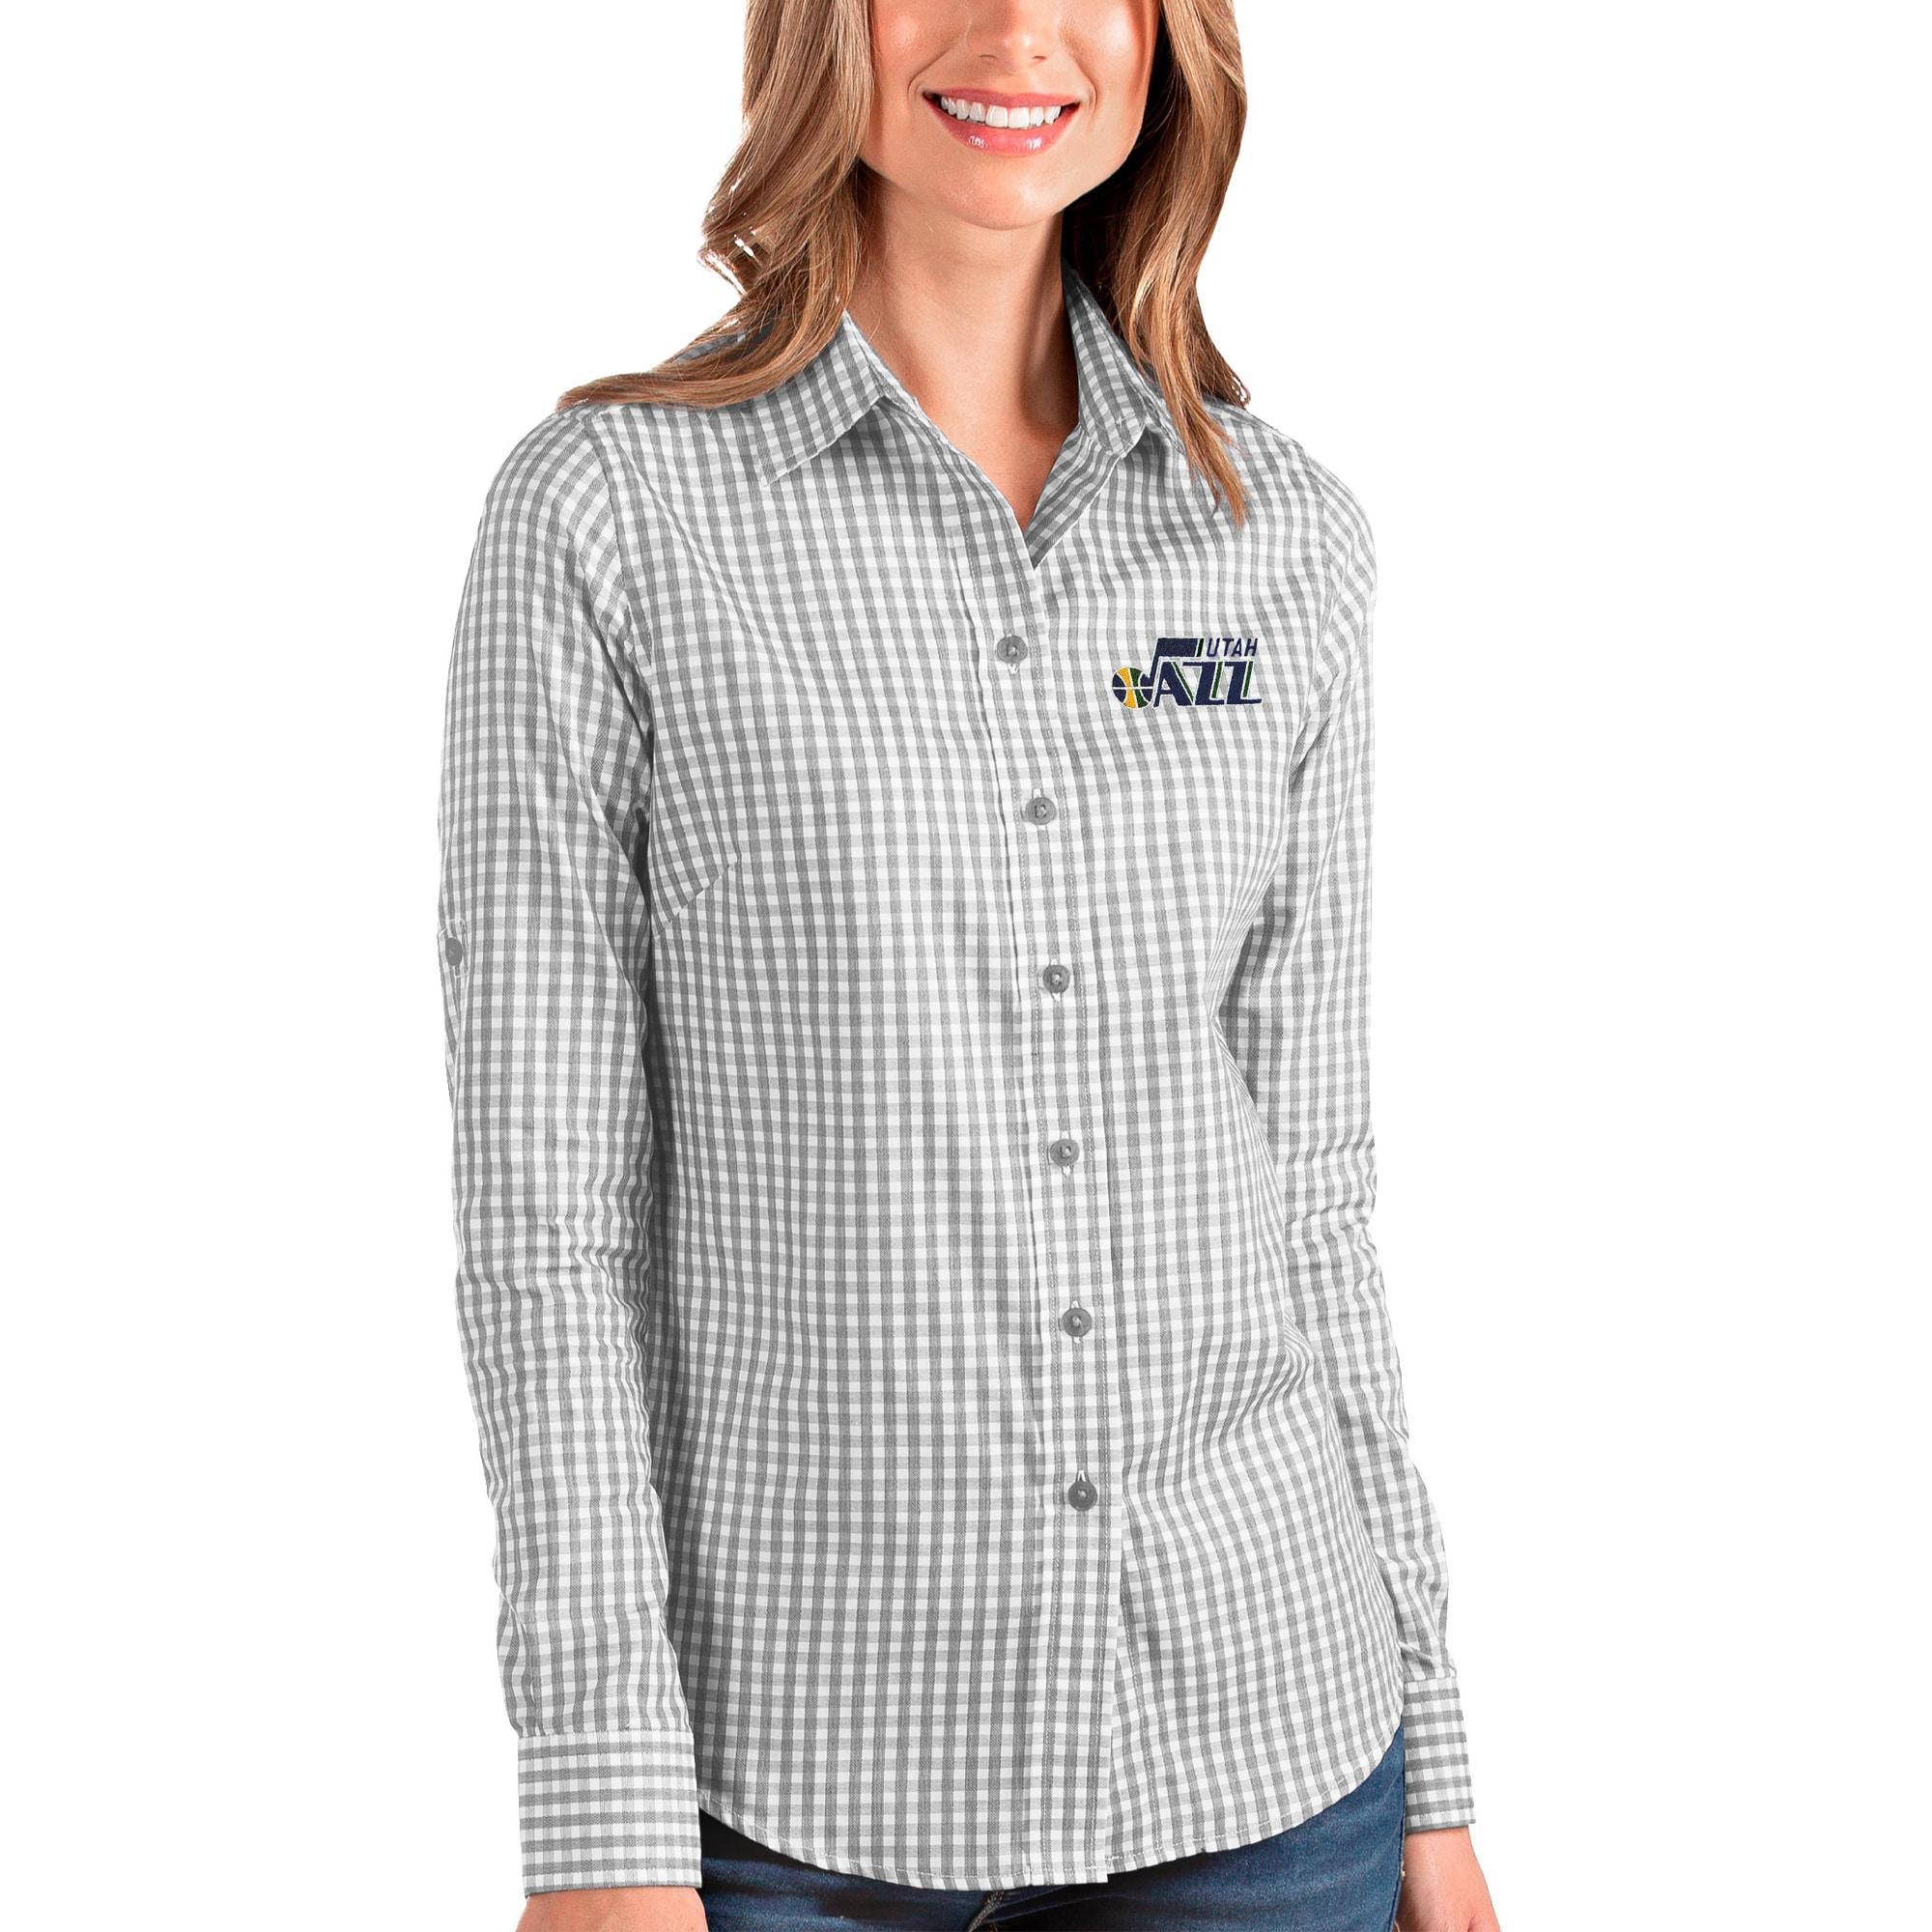 Utah Jazz Antigua Women's Structure Button-Up Long Sleeve Shirt - Charcoal/White